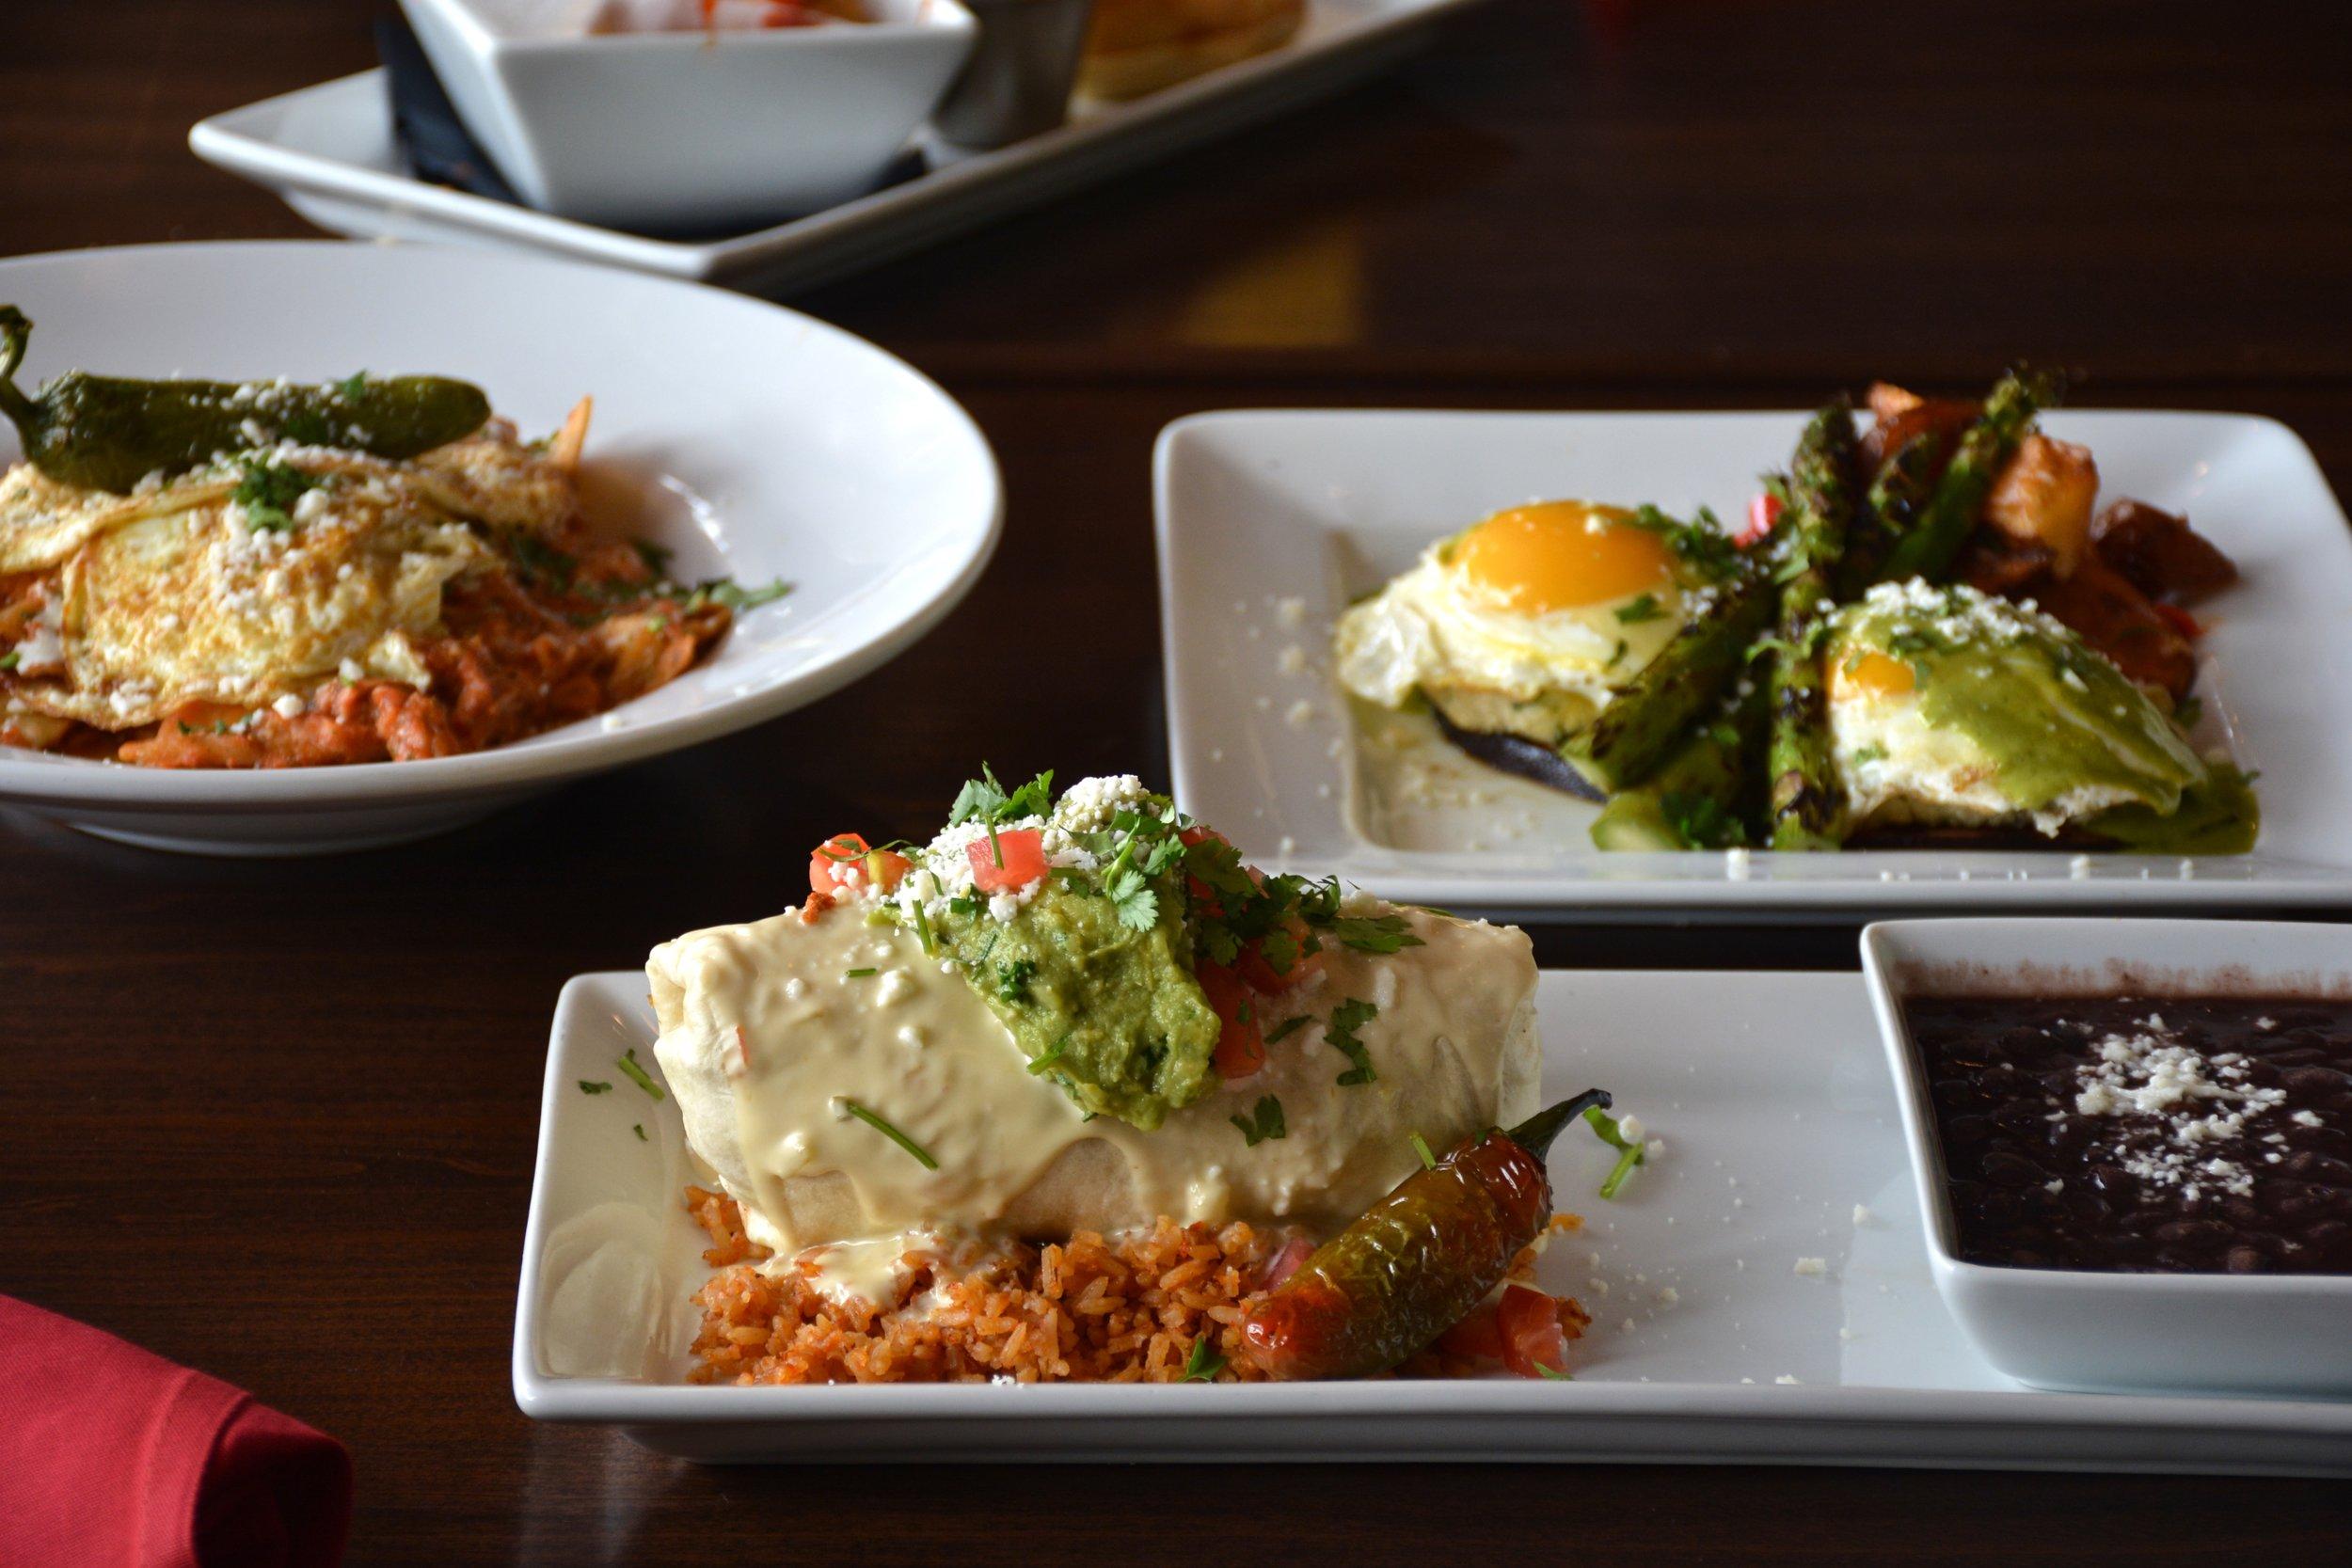 Best Brunch in Kansas City: Zocalo Mexican Cuisine & Tequileria